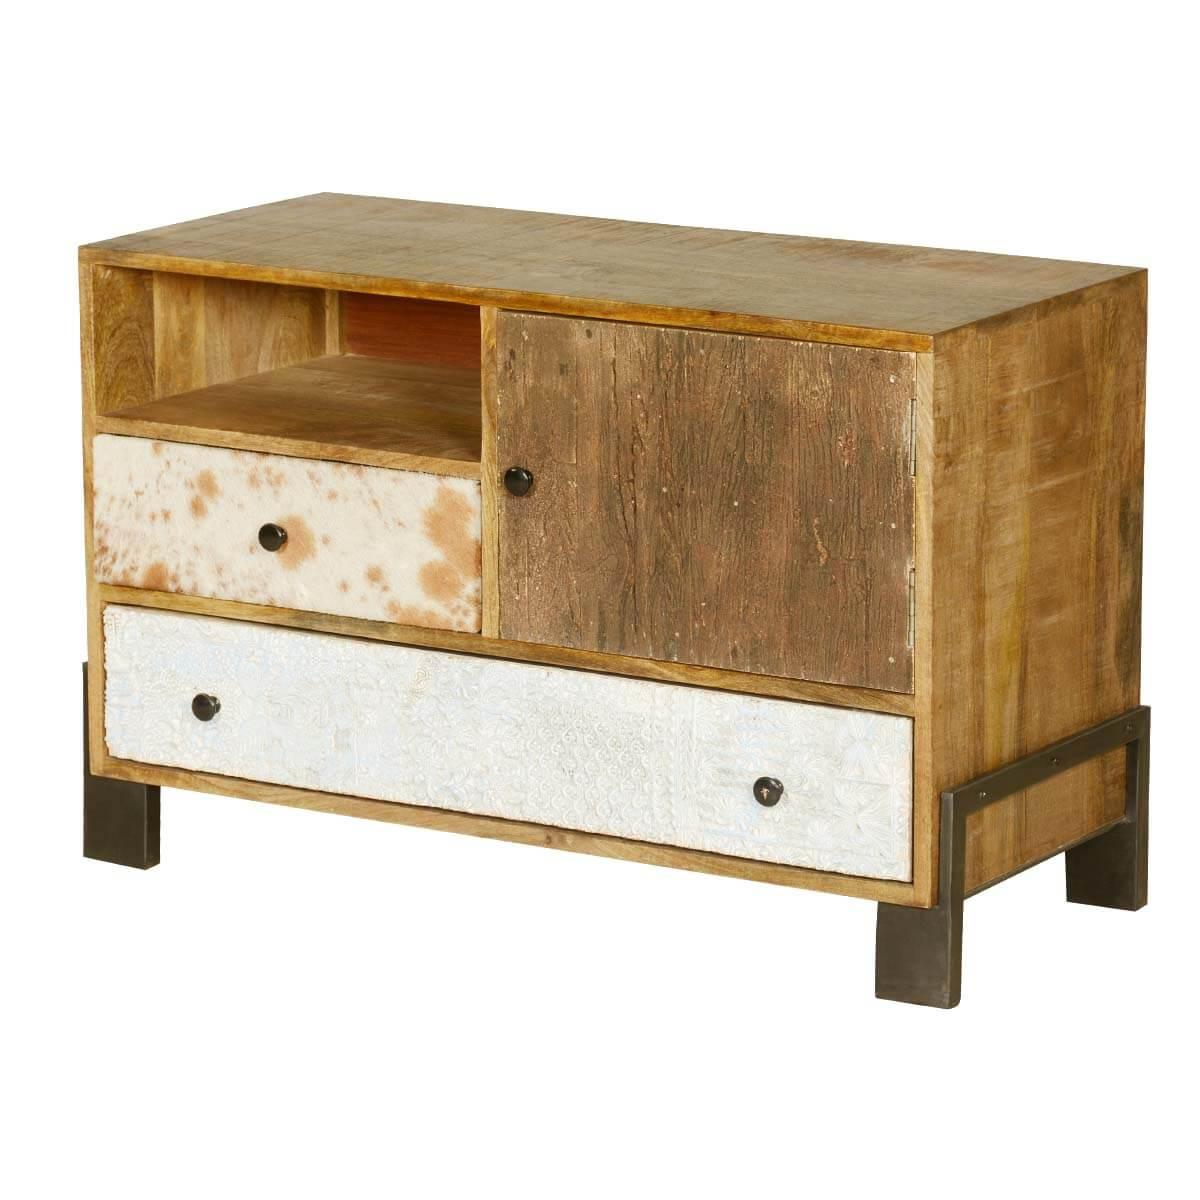 60's Retro Mango Wood & Iron 4 Compartment 2 Drawer Chest